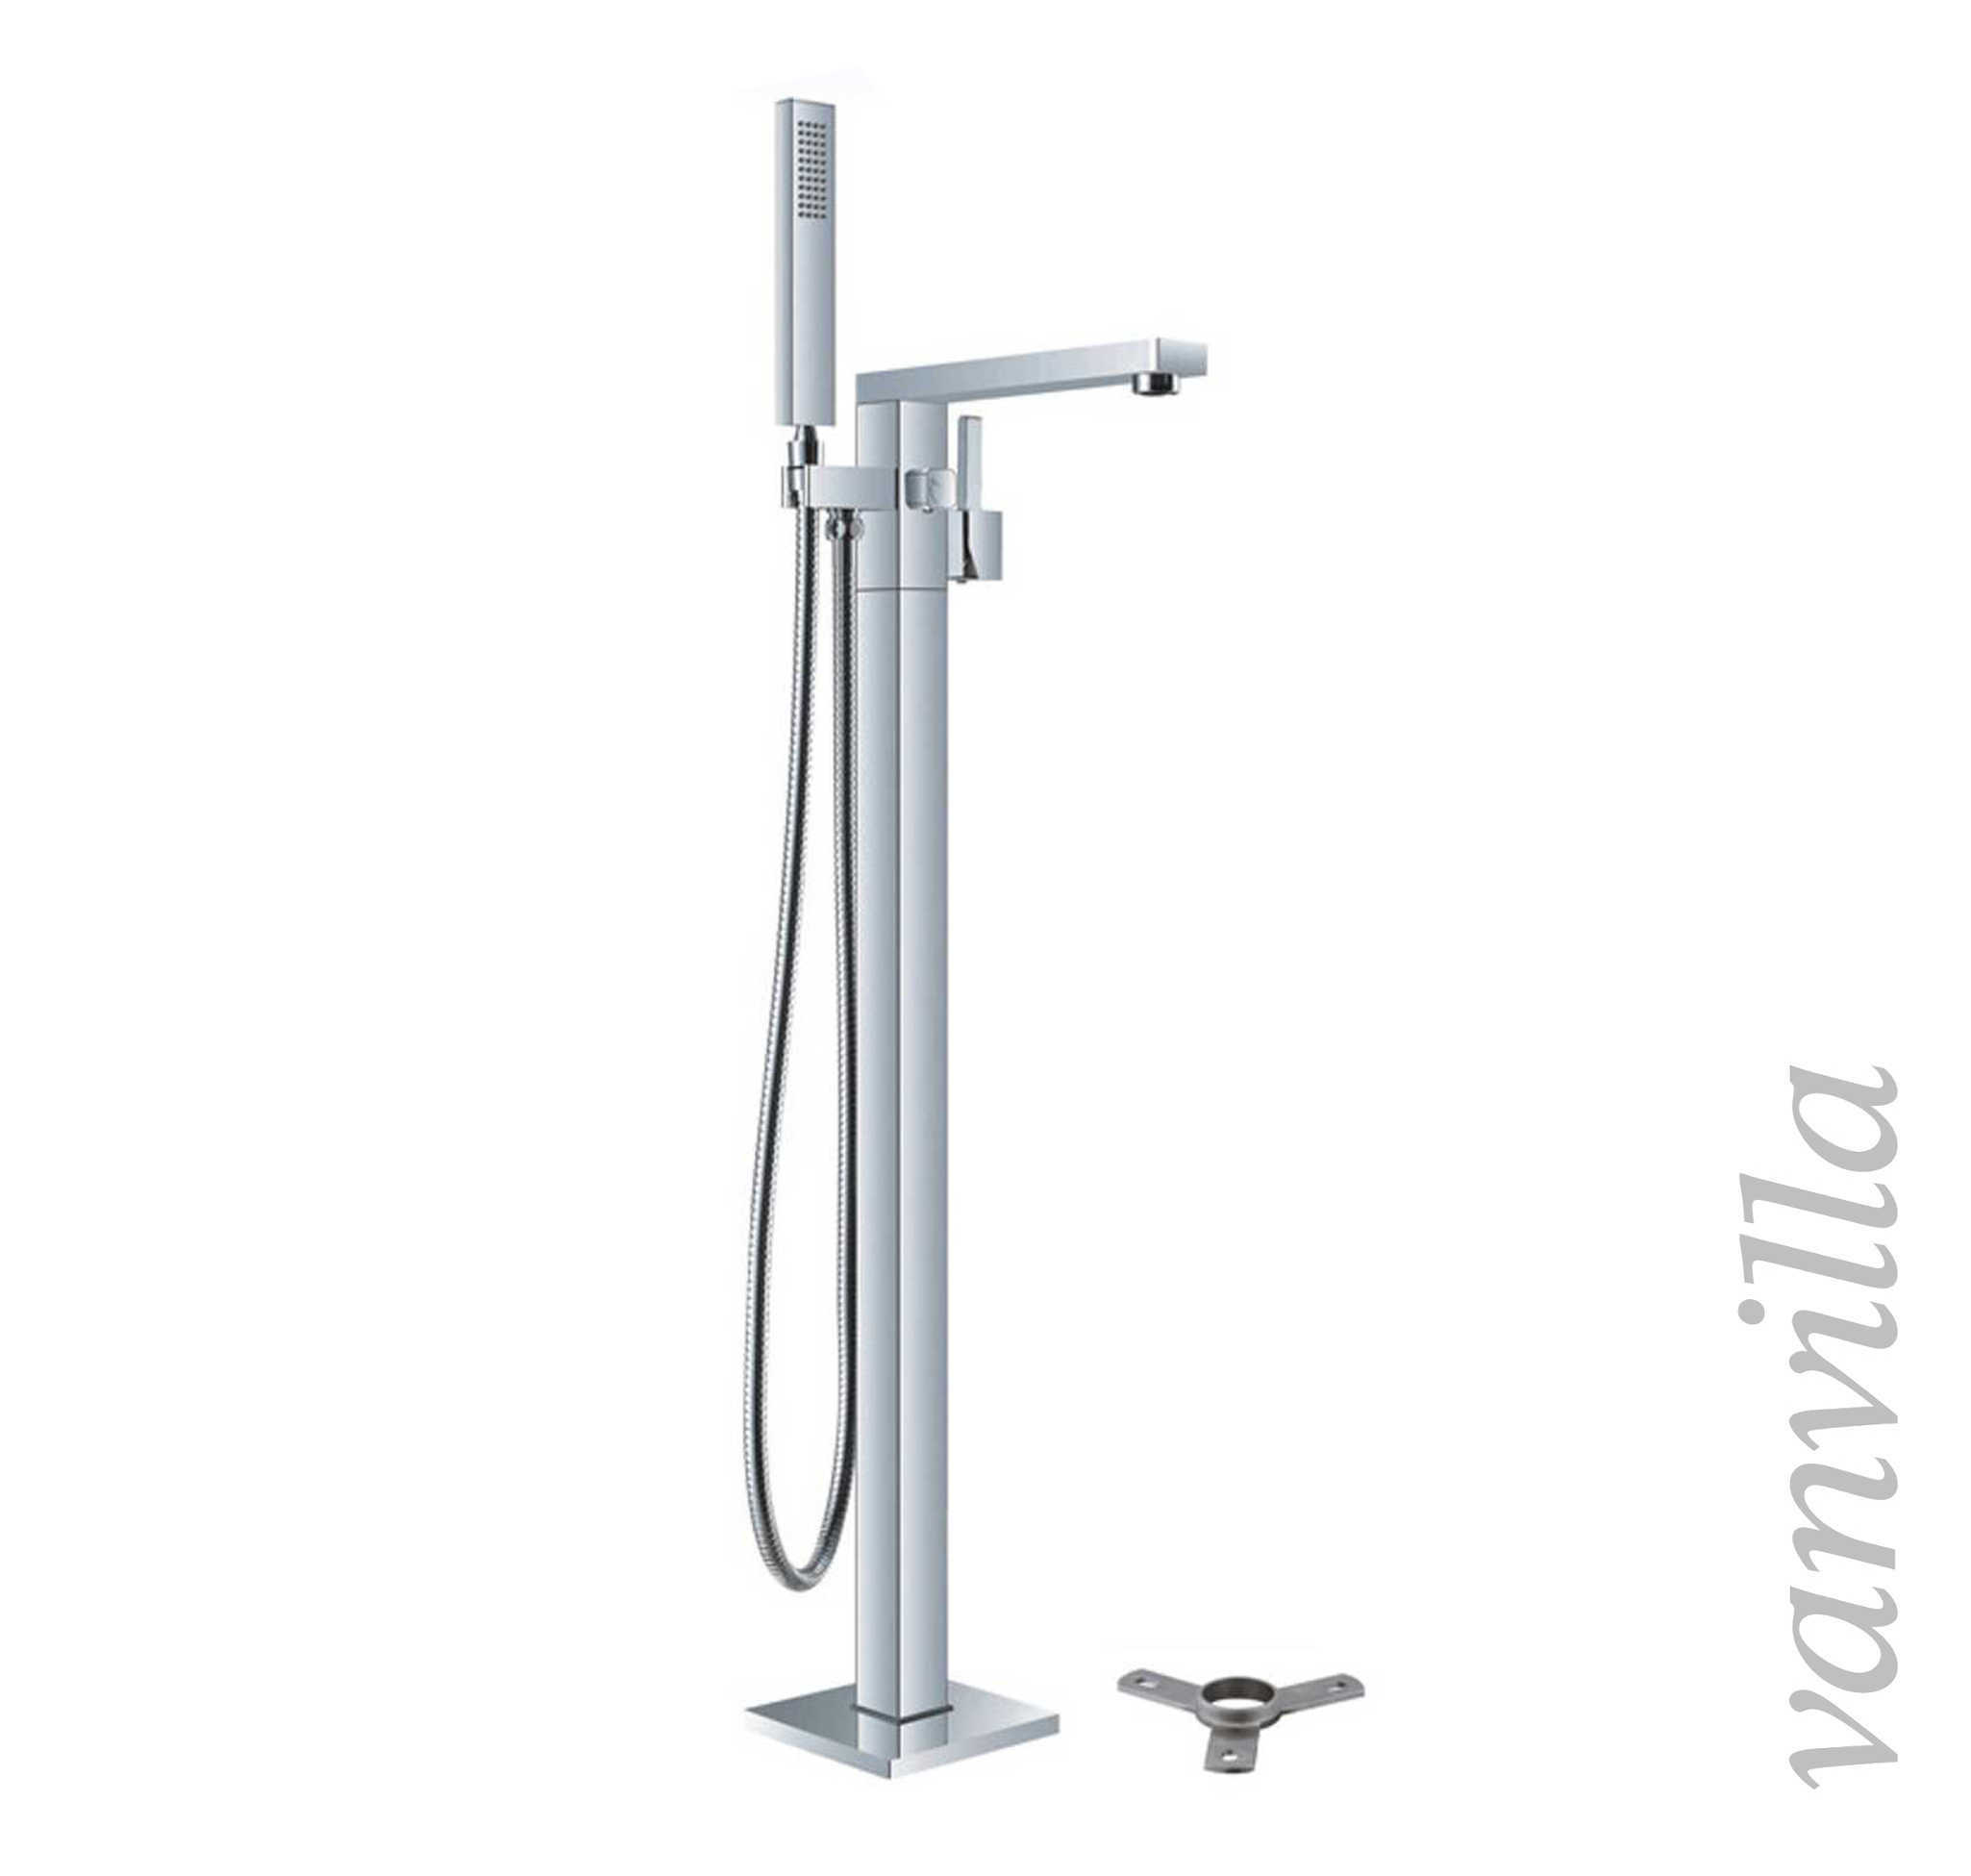 vanvilla freistehende standarmatur f r badewanne wannenarmatur stehend ebay. Black Bedroom Furniture Sets. Home Design Ideas